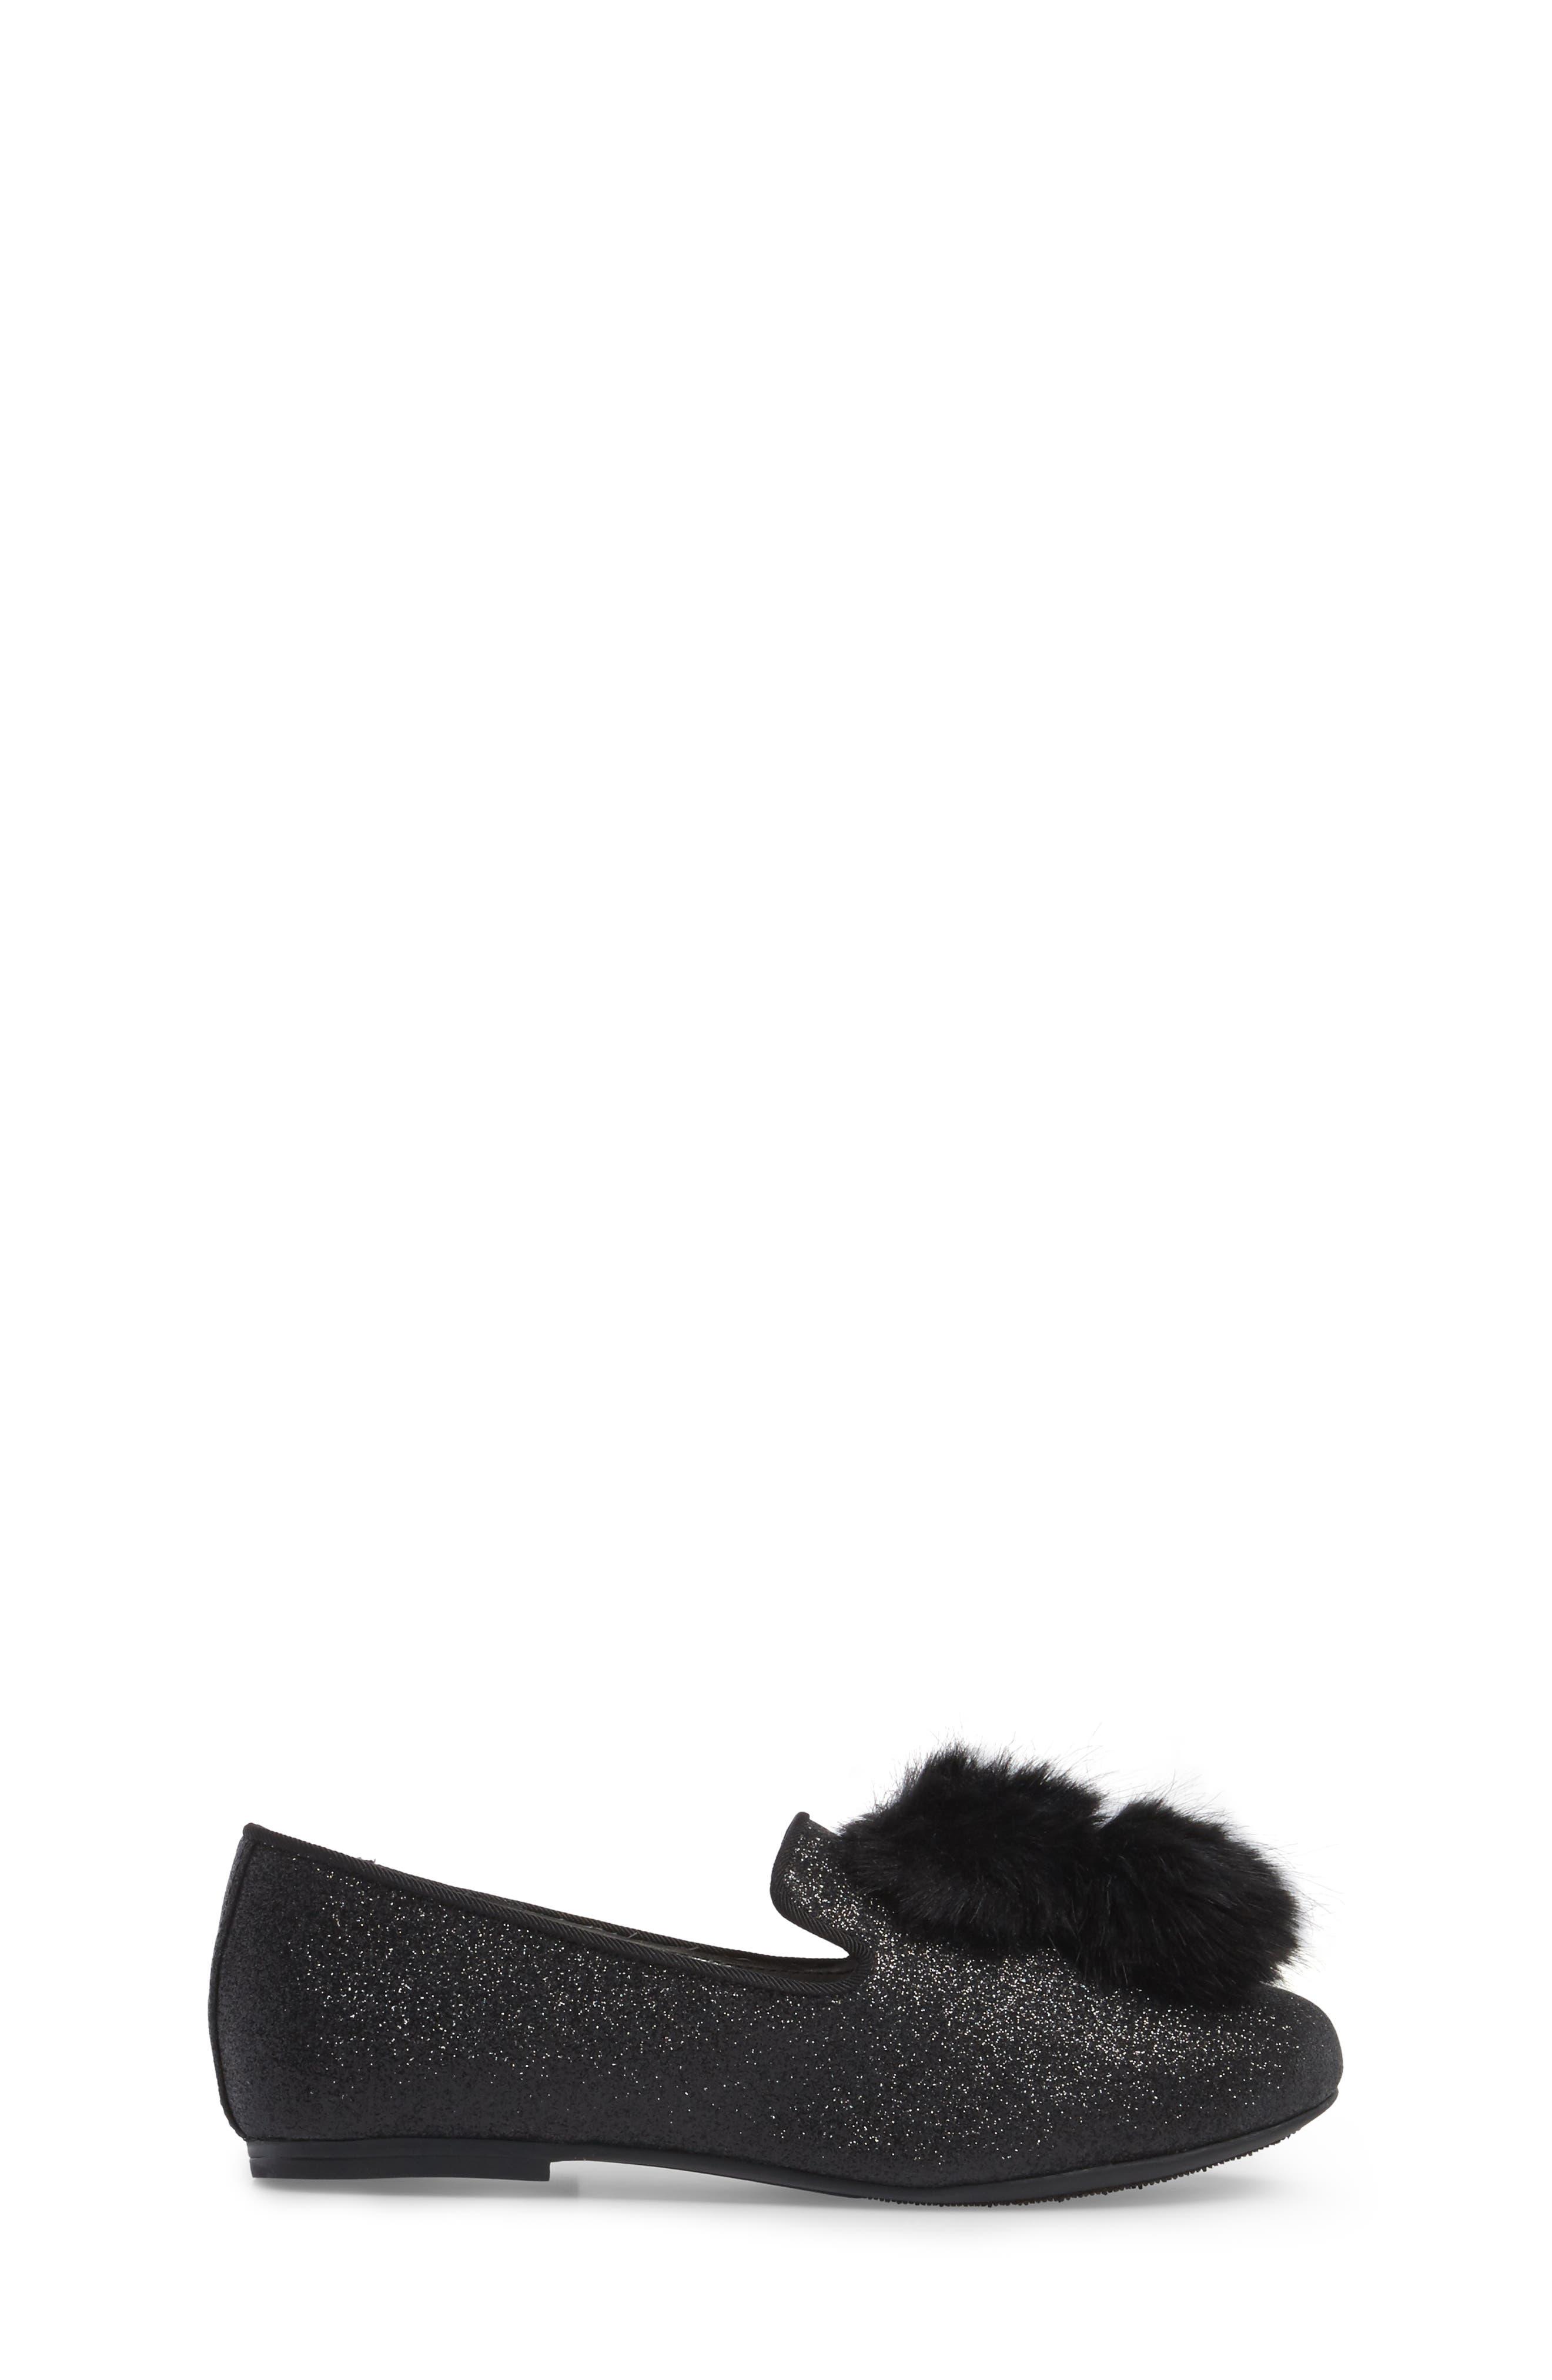 Caela Faux Fur Loafer,                             Alternate thumbnail 3, color,                             001